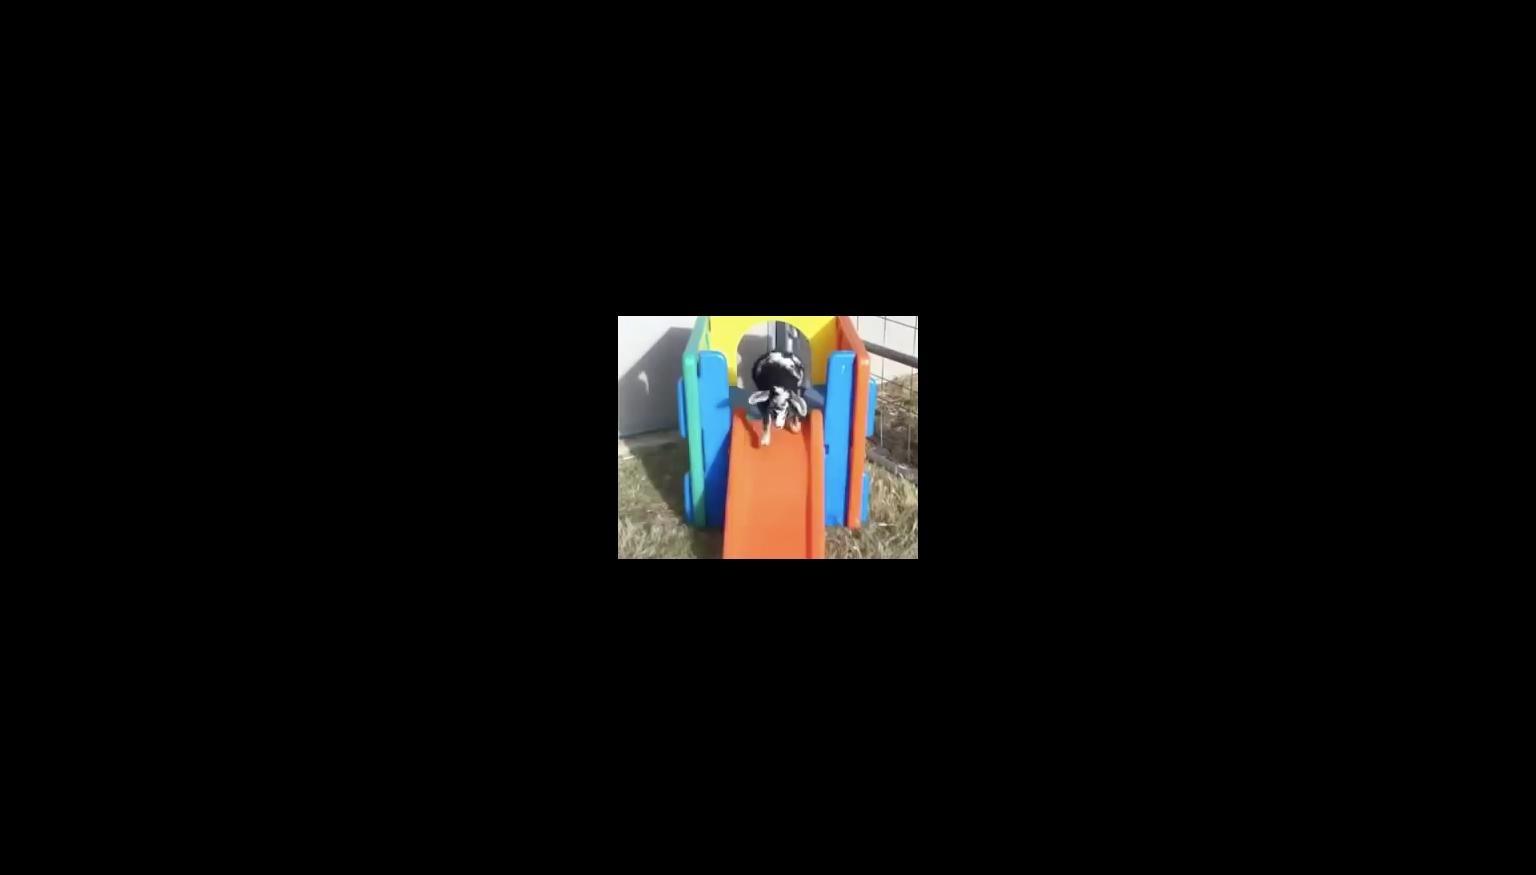 Baby goat faints going down backyard slide